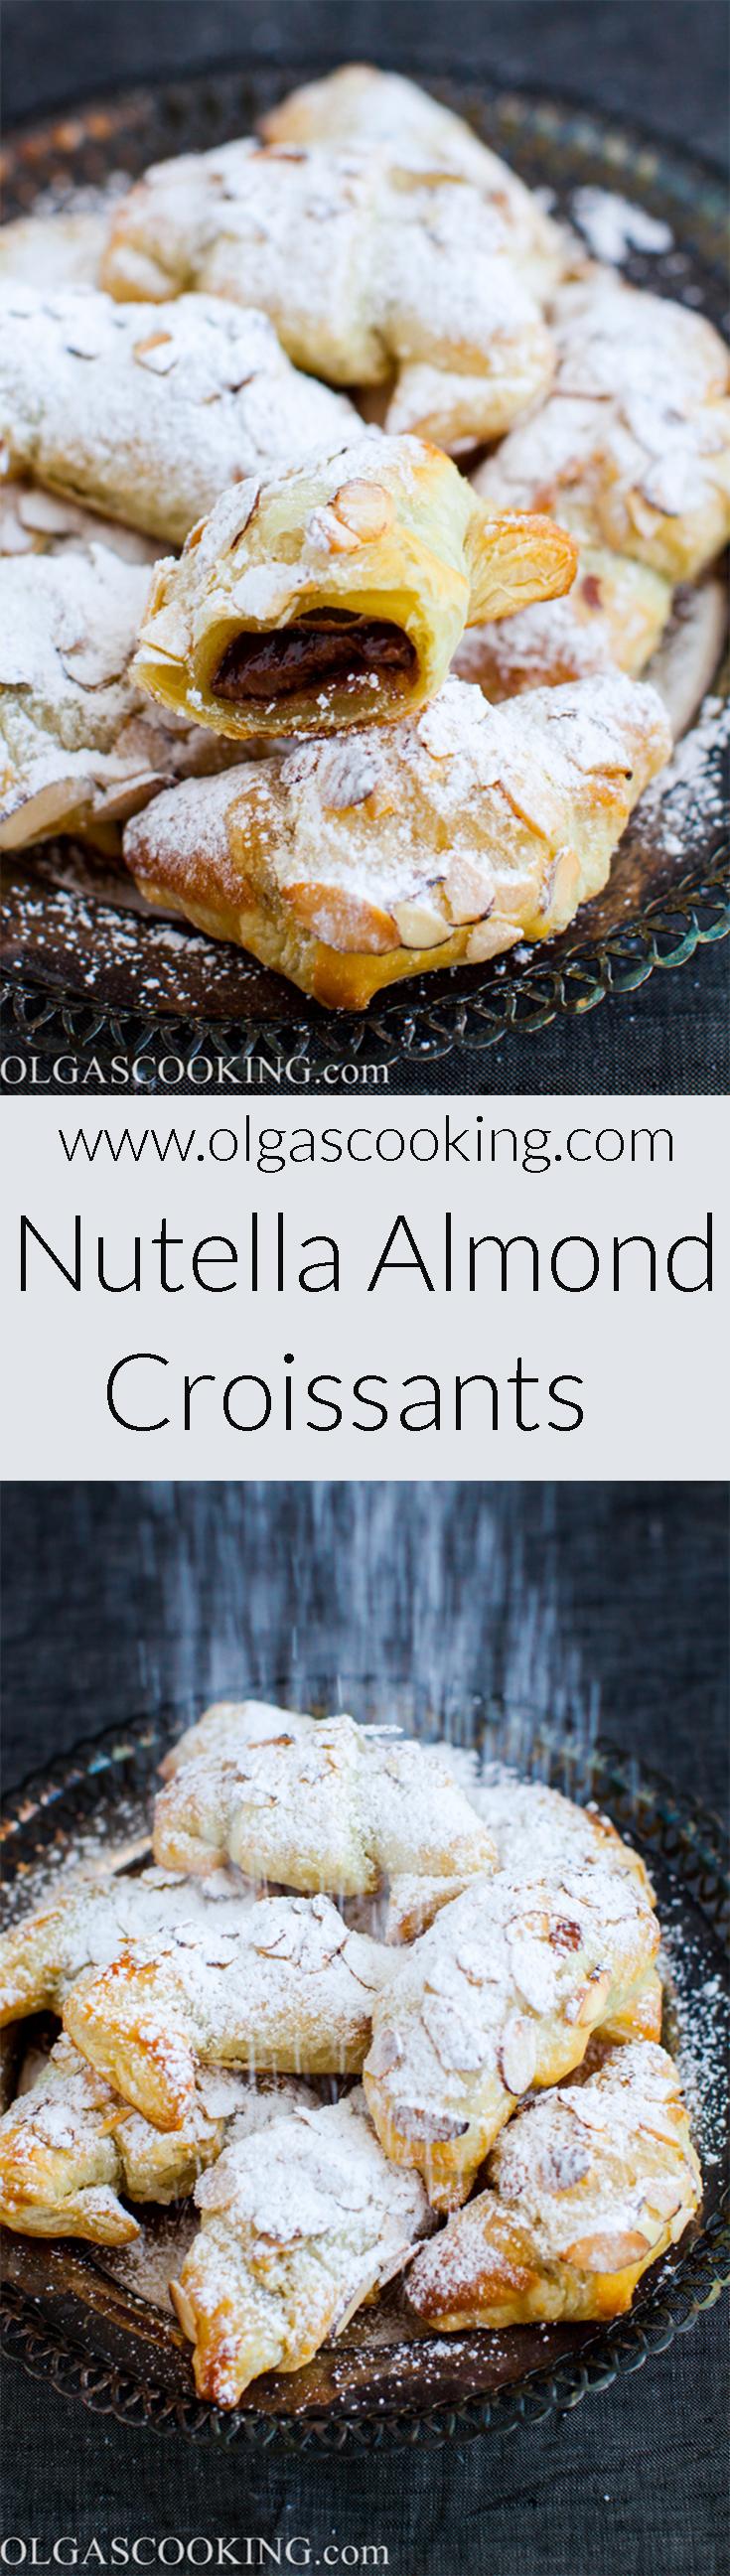 Nutella Almond Croissants